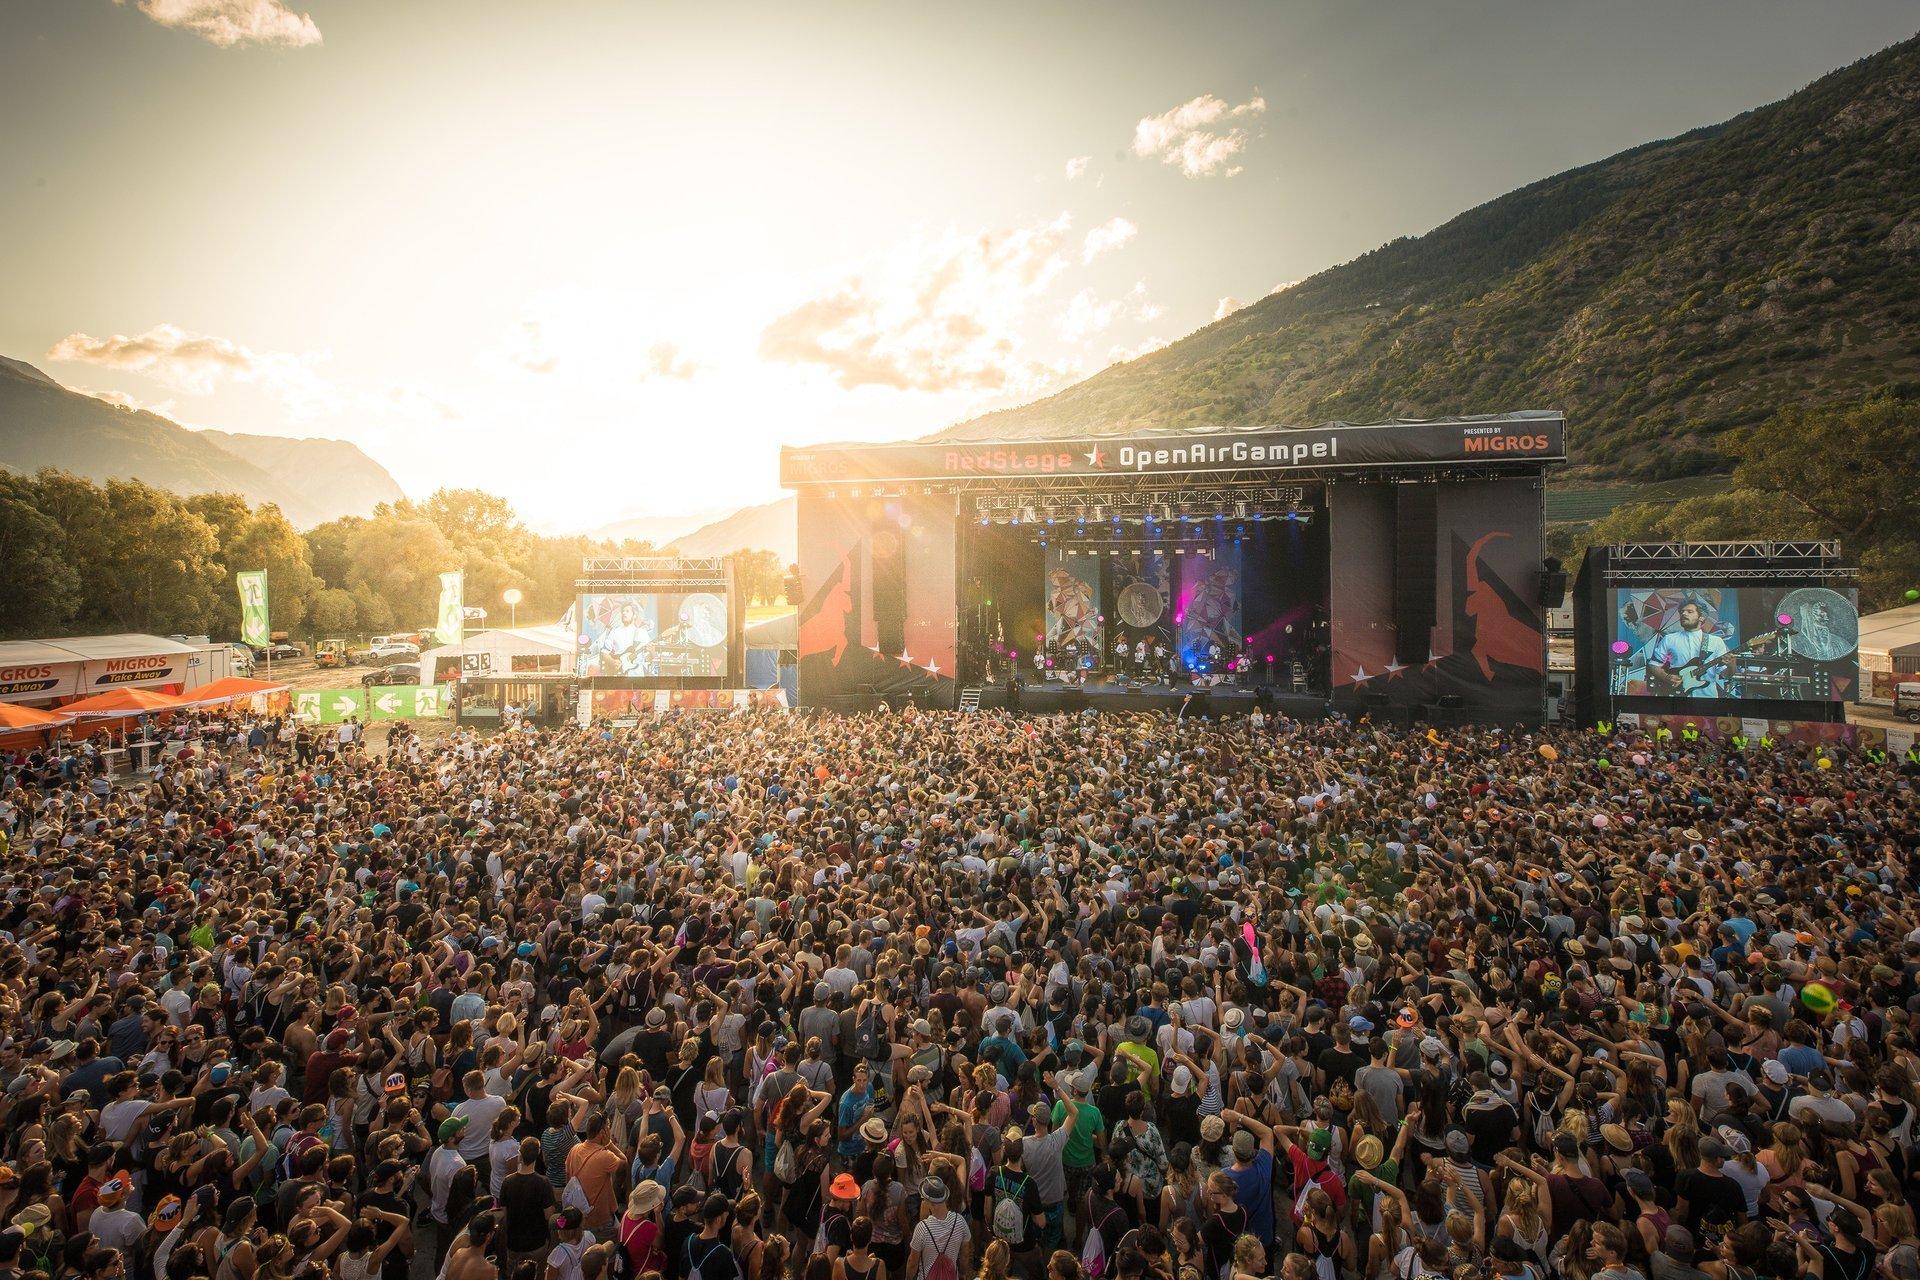 Open Air Gampel in Switzerland 2020 - Best Time